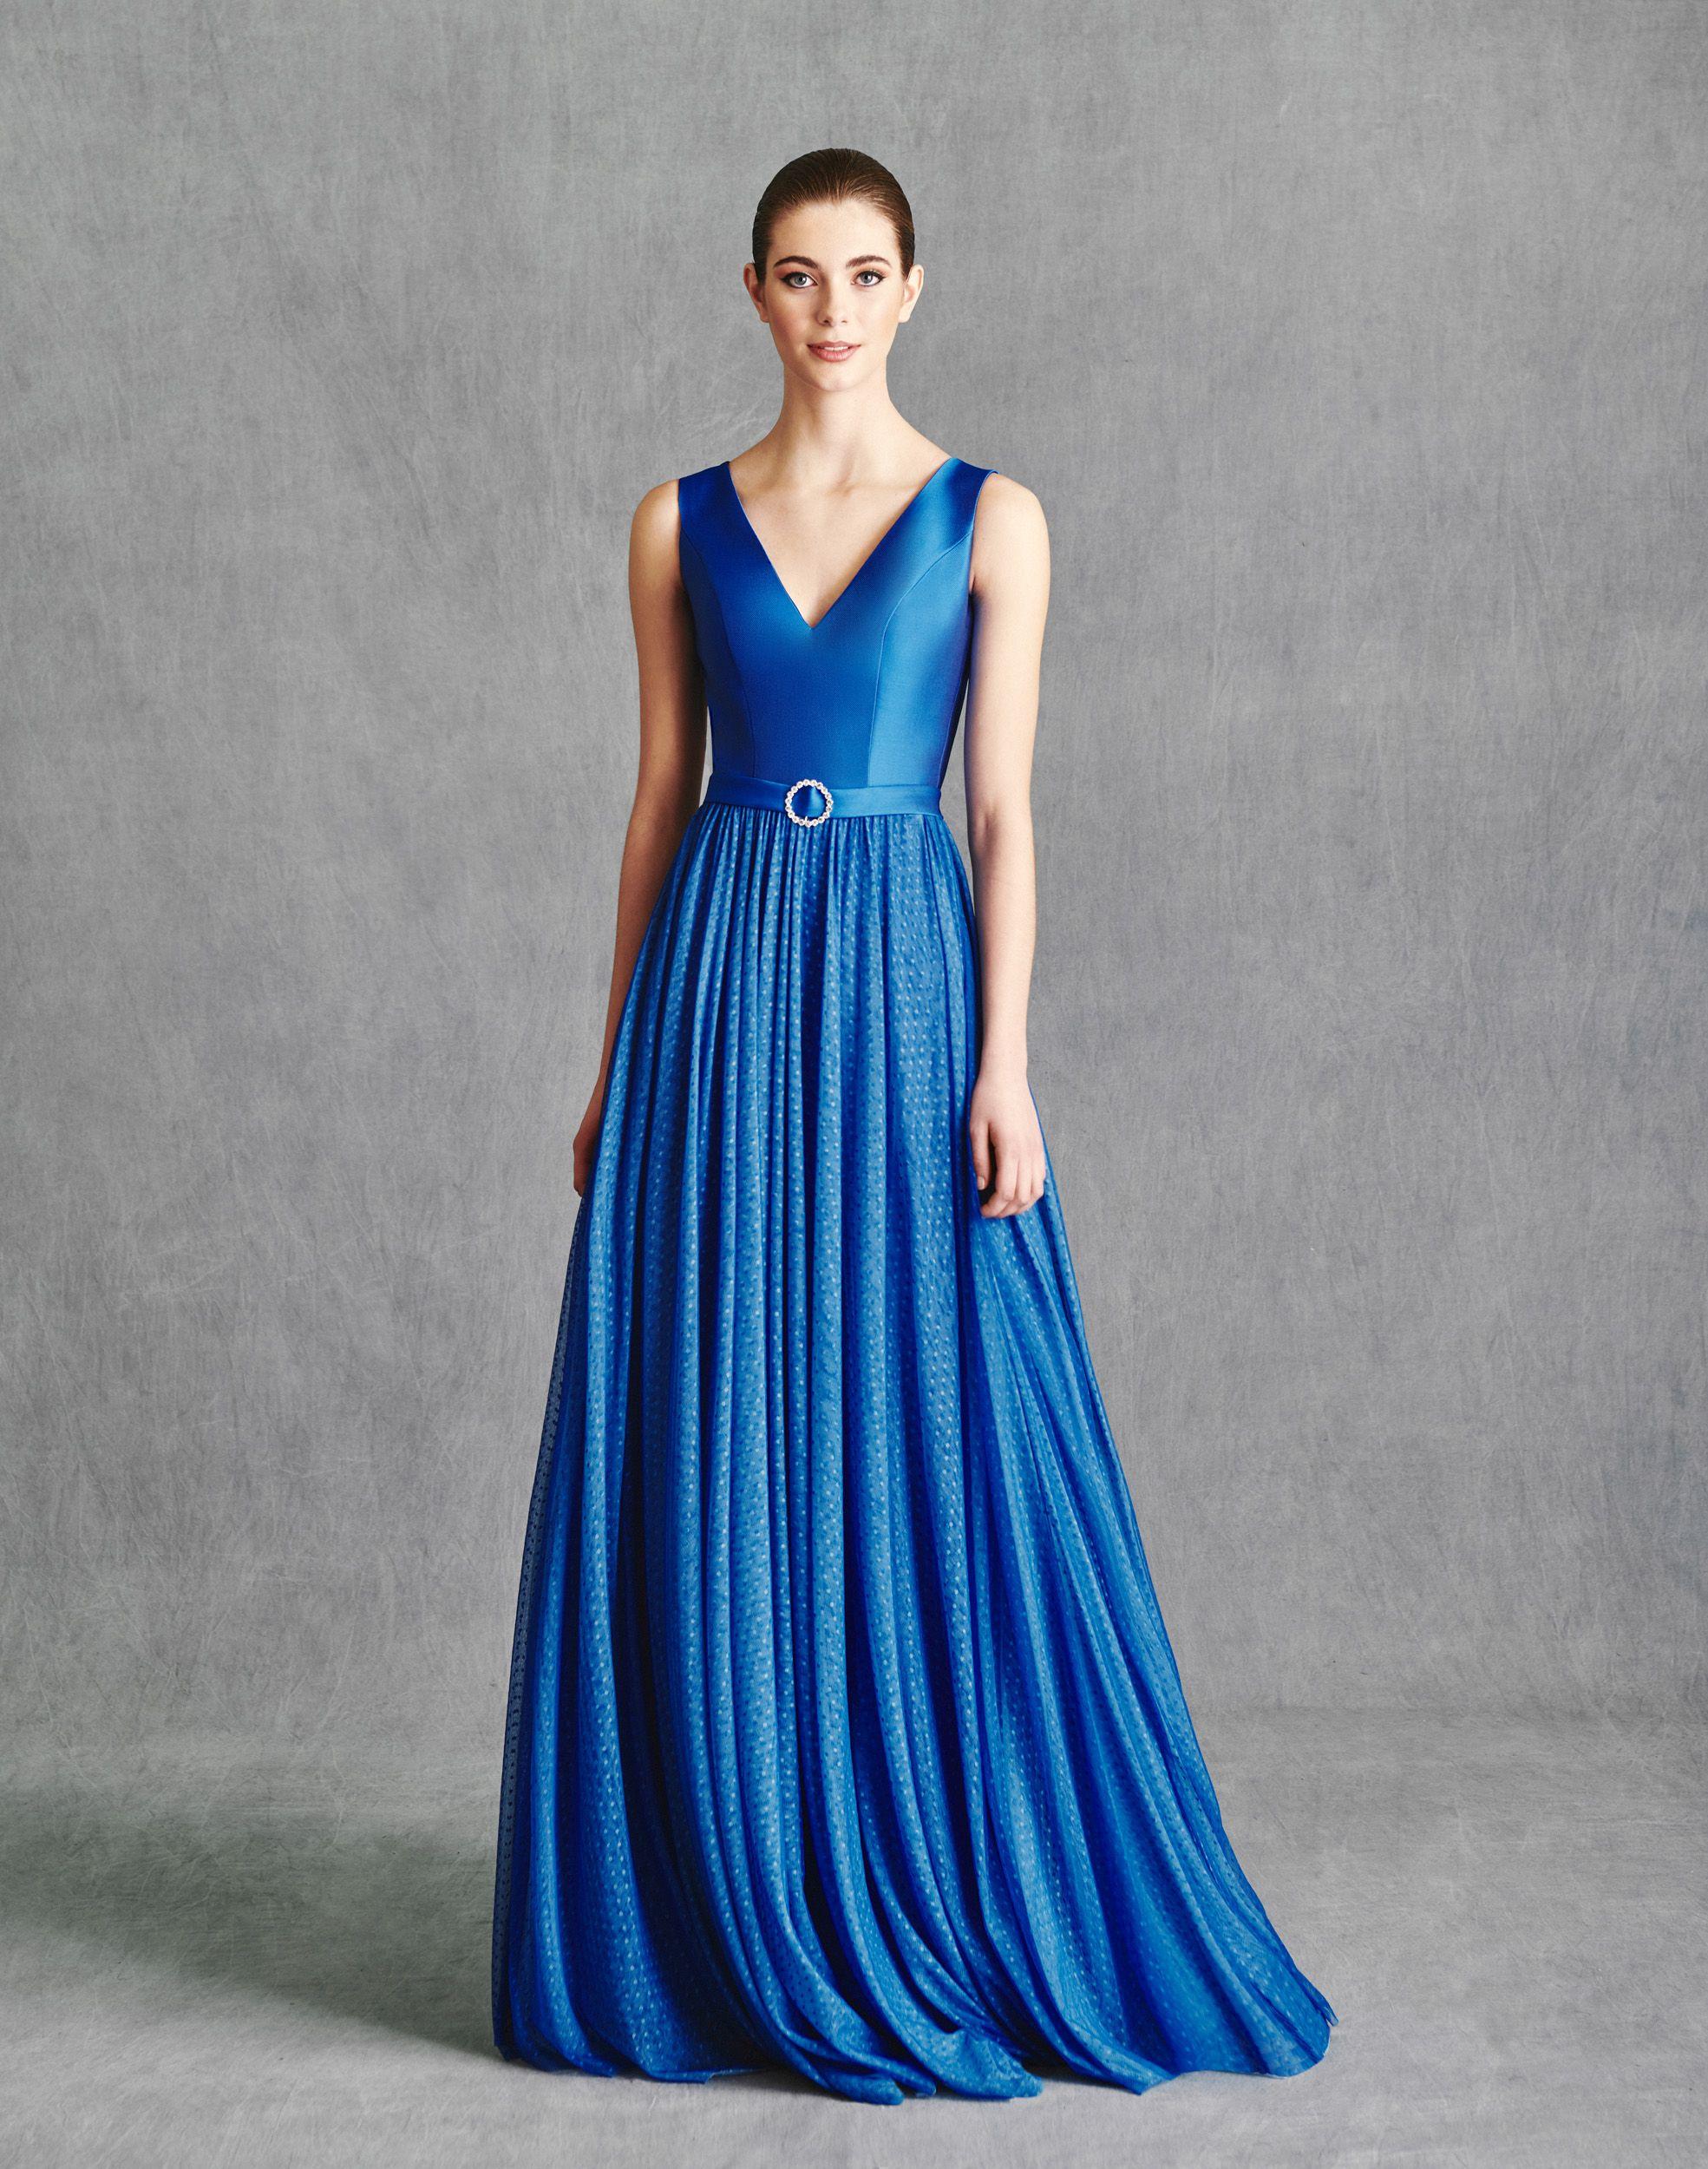 Vestidos de Fiesta 2020 - Silvia Fernandez Atelier - IRIS